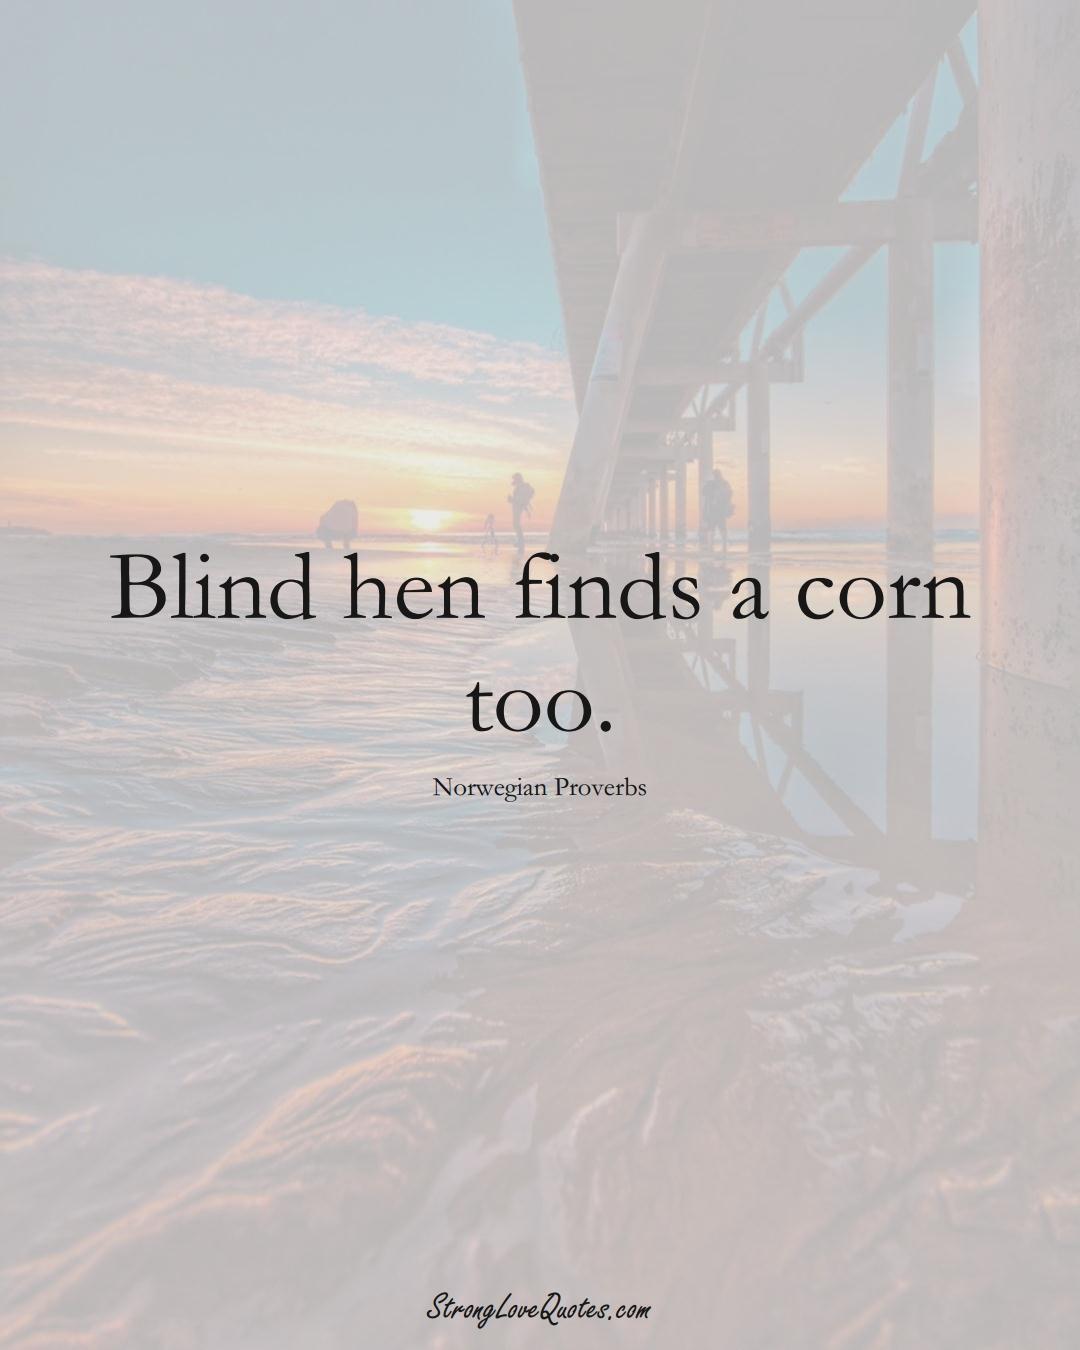 Blind hen finds a corn too. (Norwegian Sayings);  #EuropeanSayings